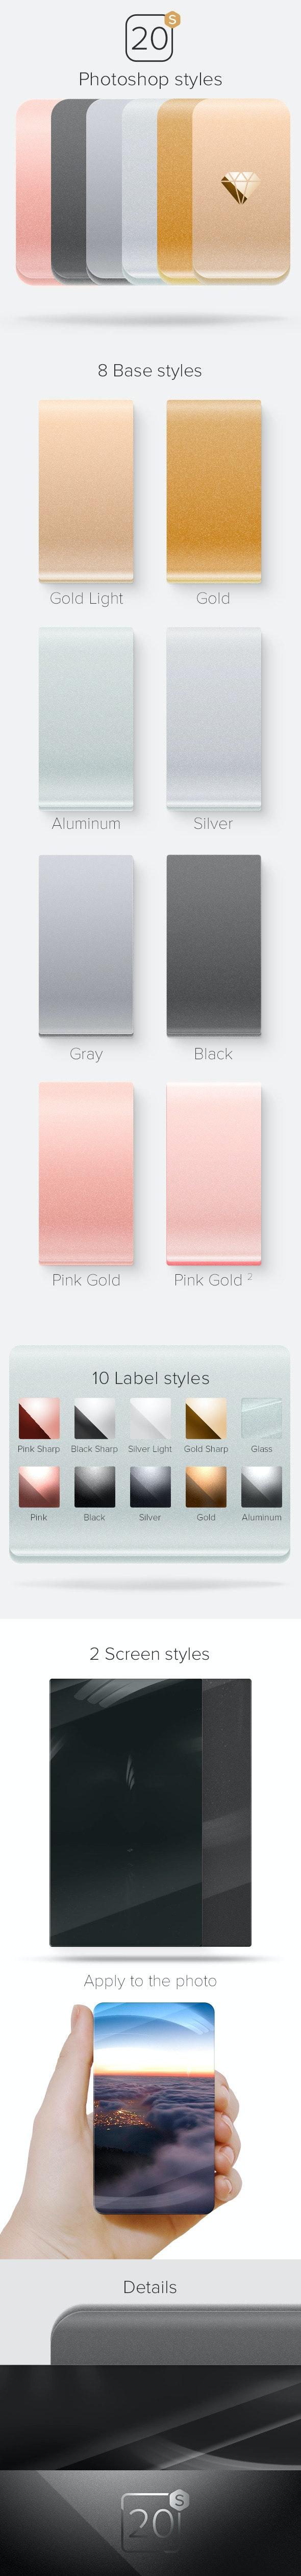 20S Styles - Styles Photoshop